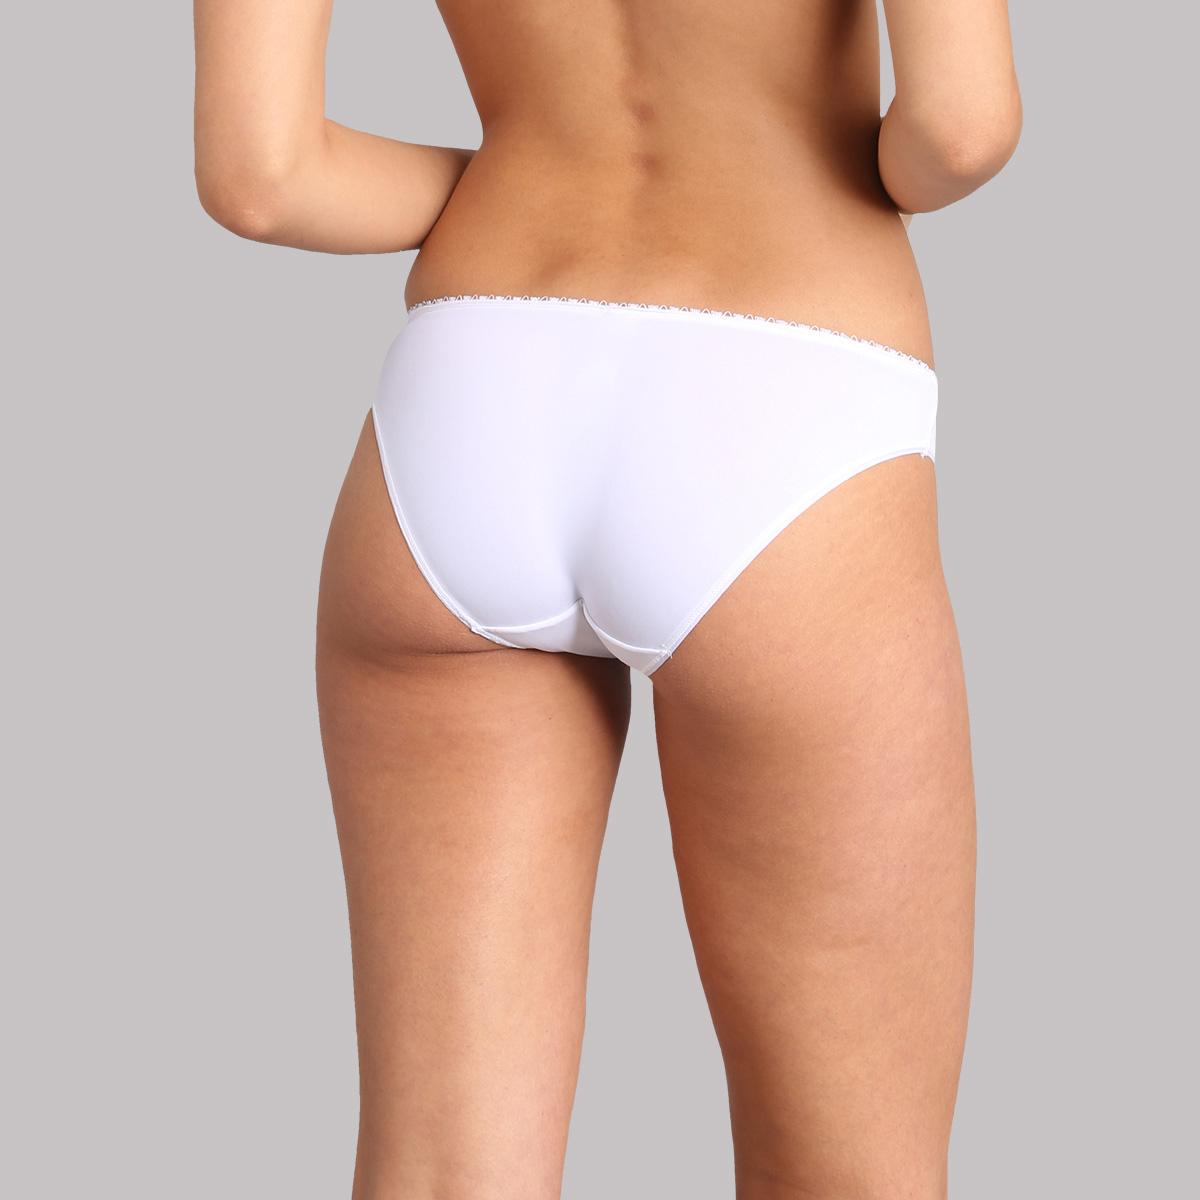 Bikini knickers in white blossom print - Flower Elegance Micro, , PLAYTEX